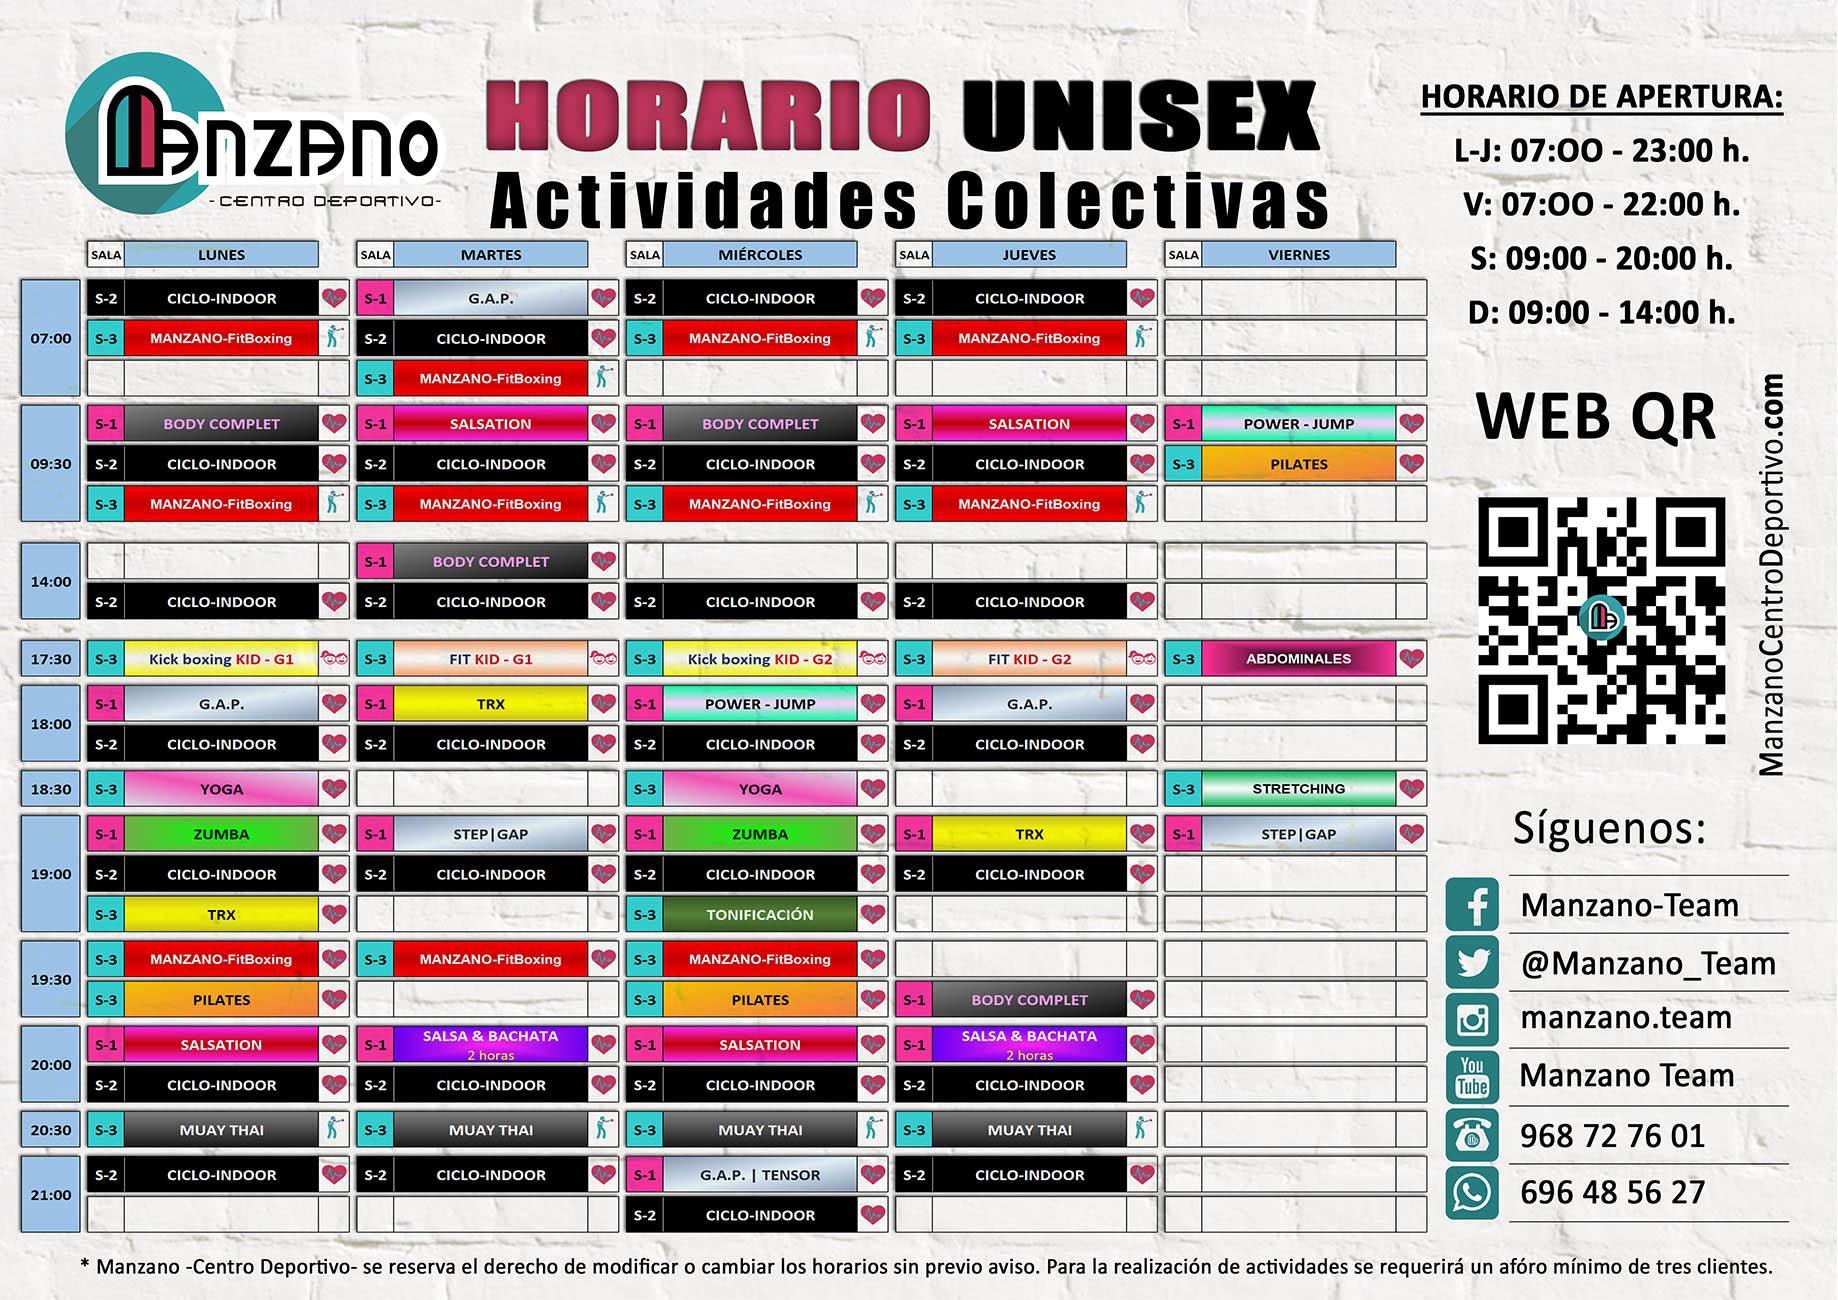 horario-2020-4.jpg